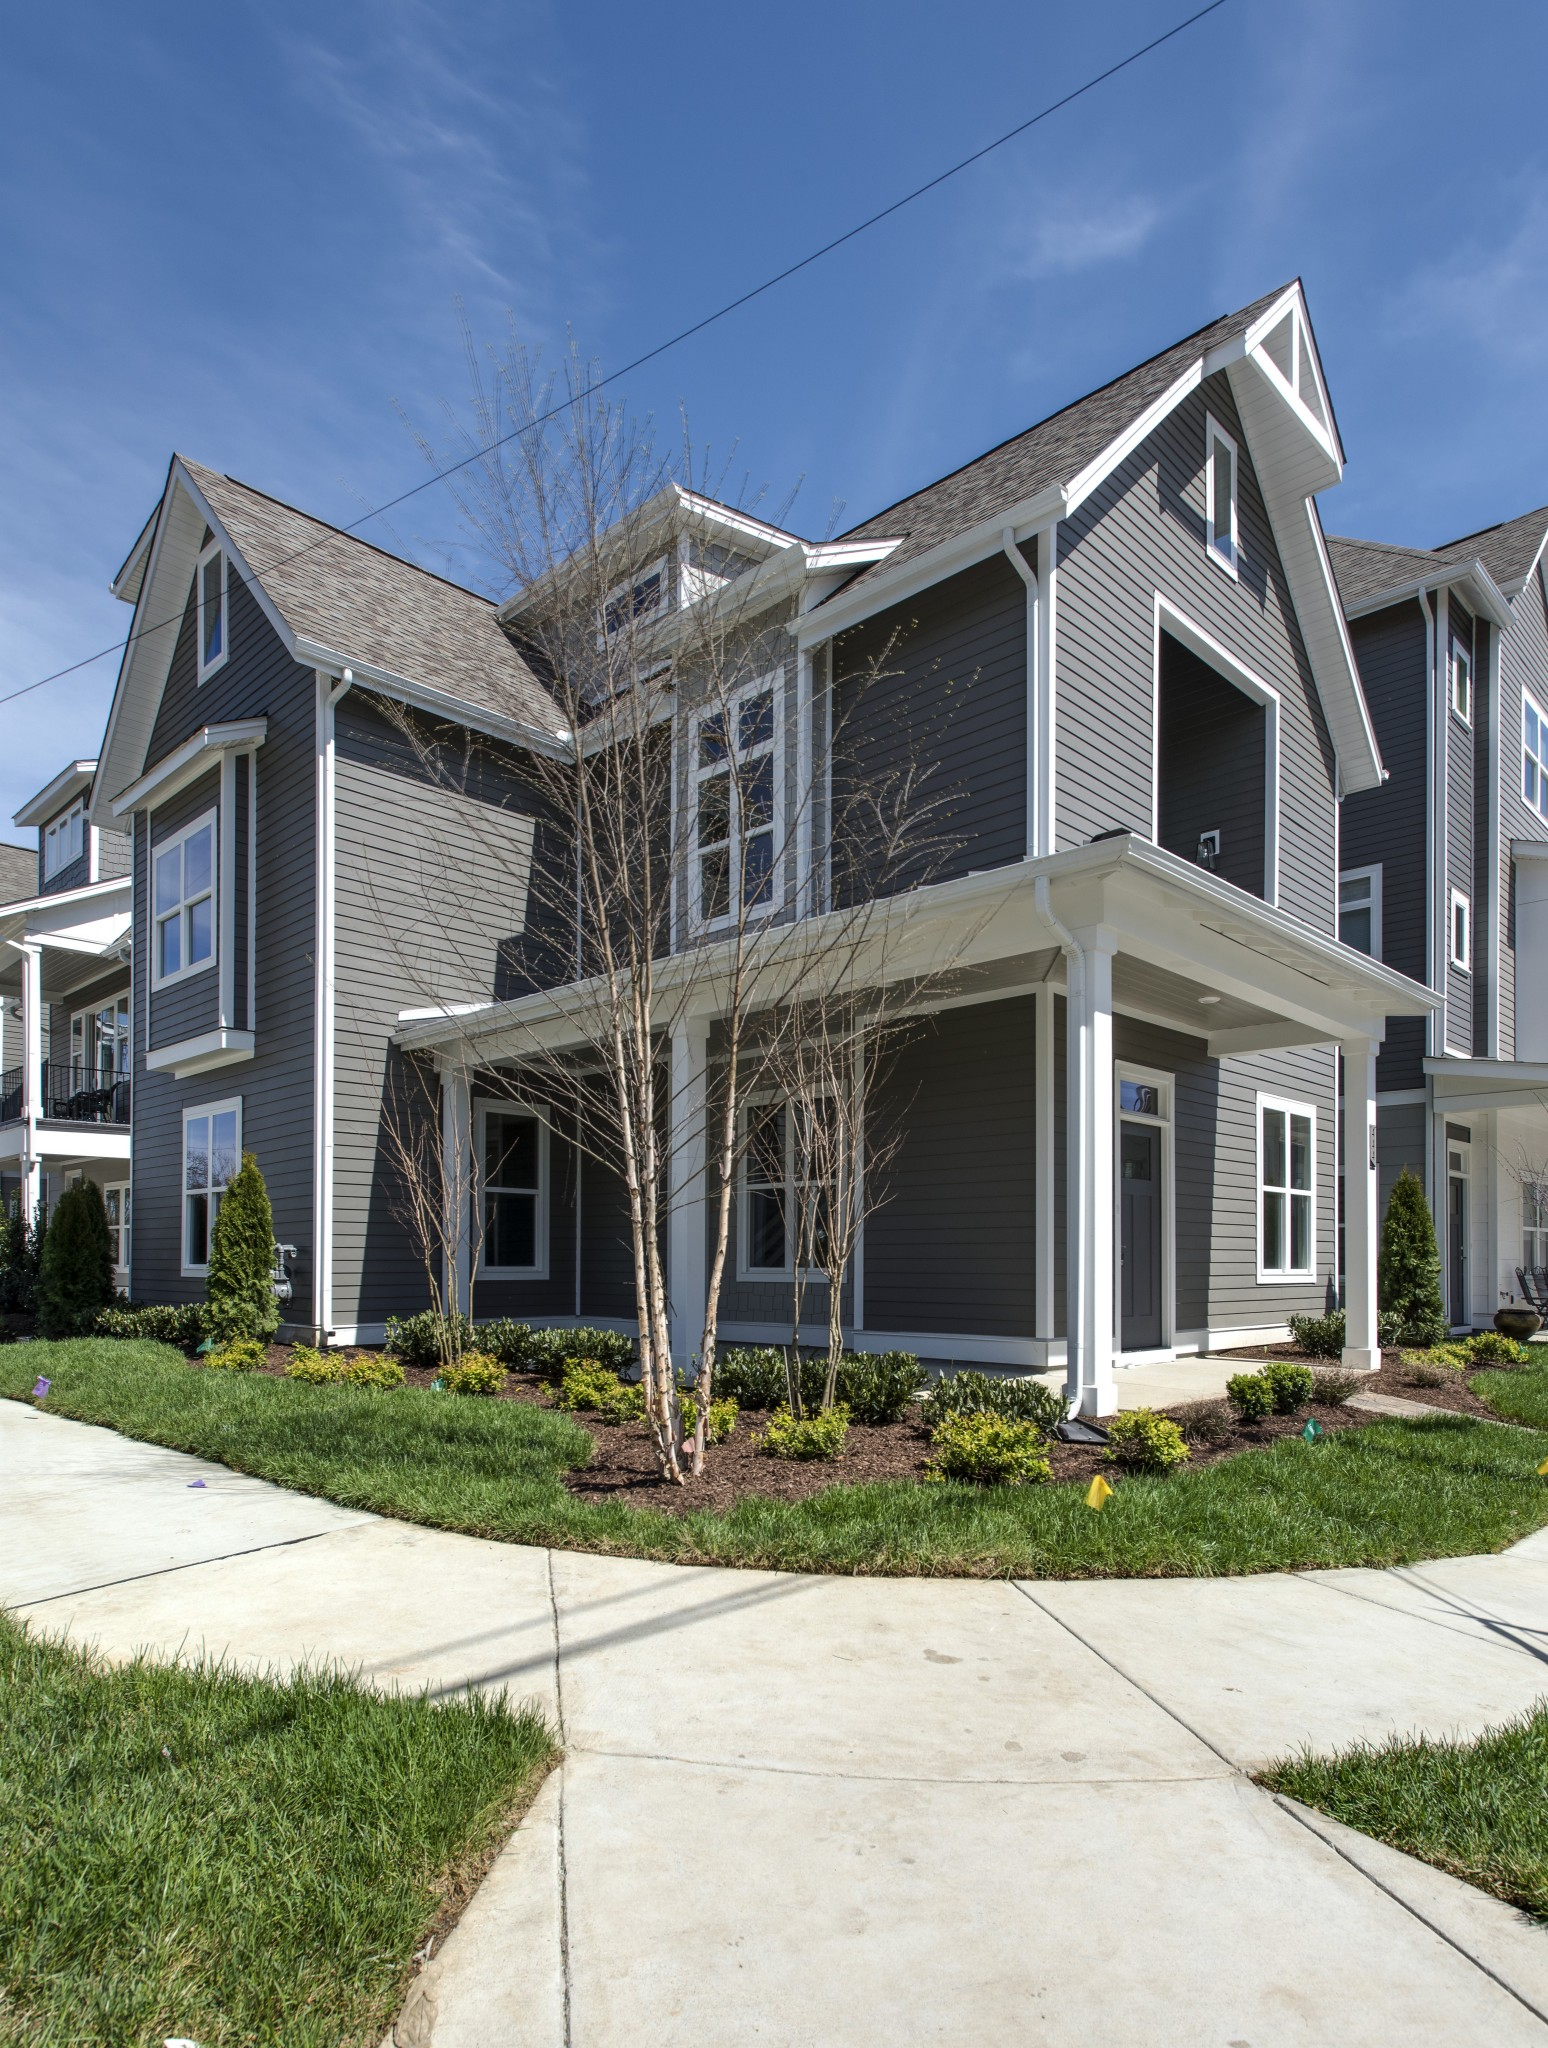 444 Merritt Ave Property Photo - Nashville, TN real estate listing